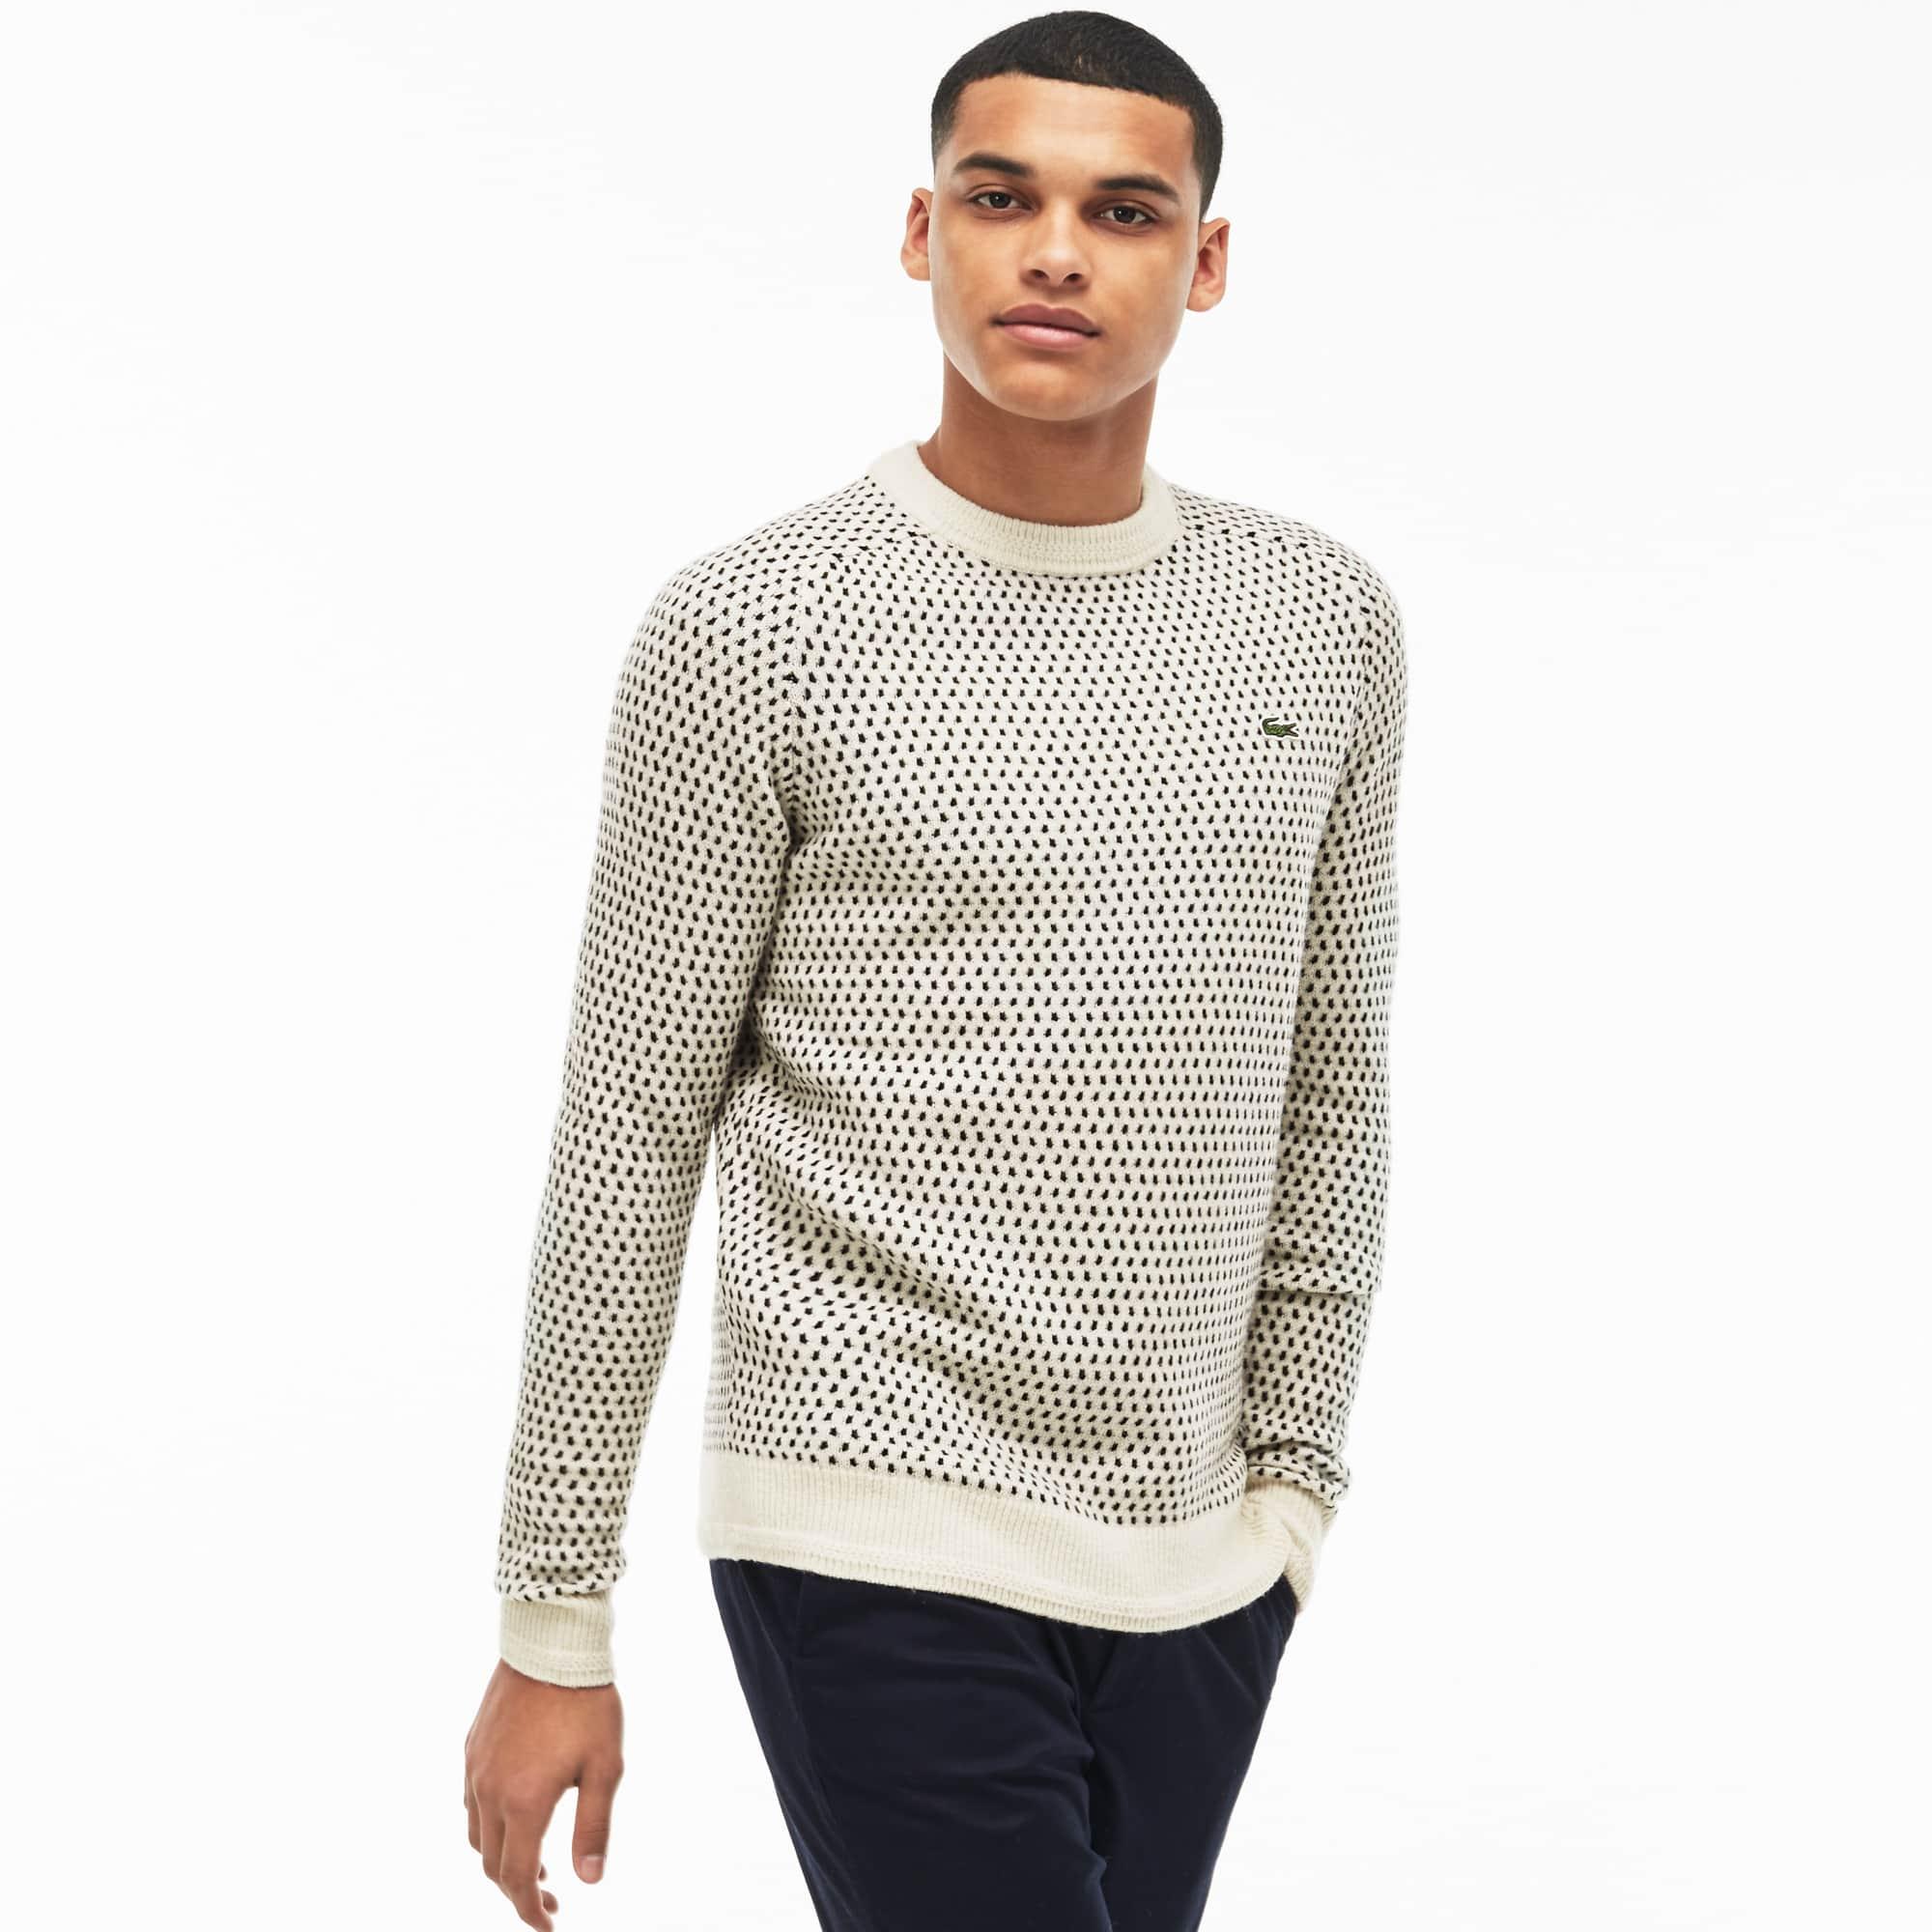 Herren-Rundhalspullover aus Mini-Jacquard mit Wolle LACOSTE L!VE